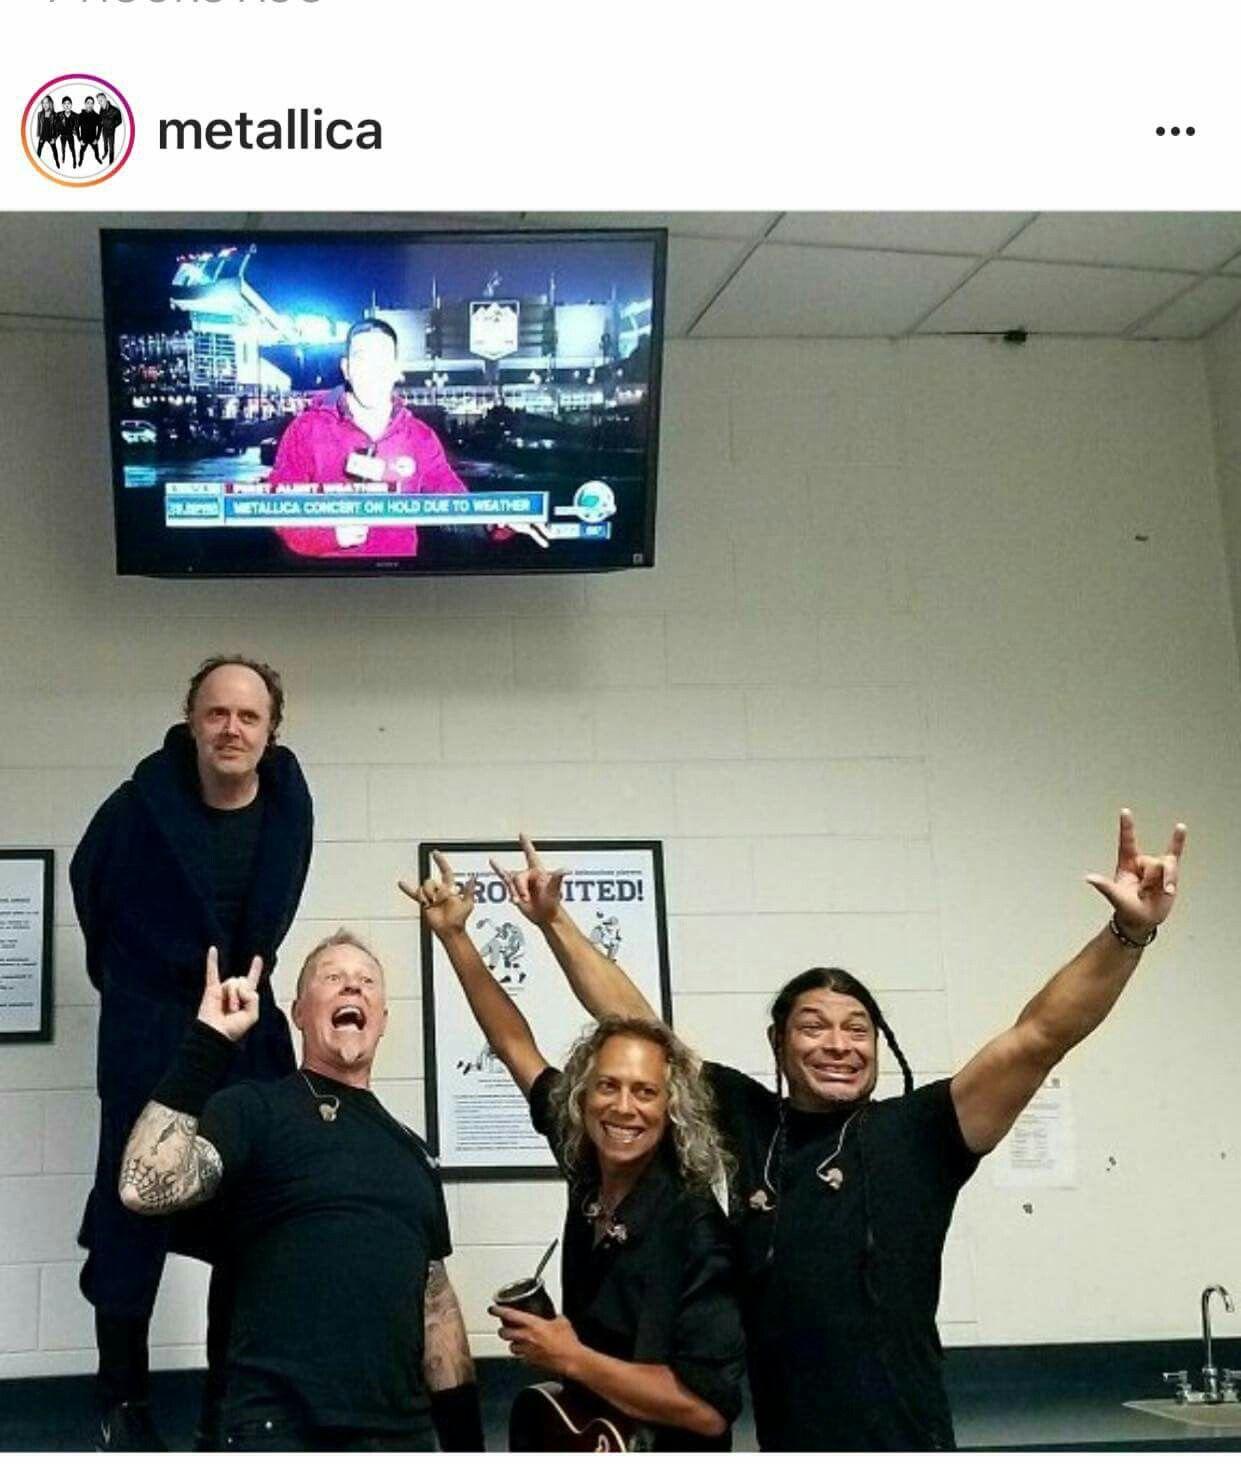 Ride the Lightning!! Metallica concert, Metallica, James